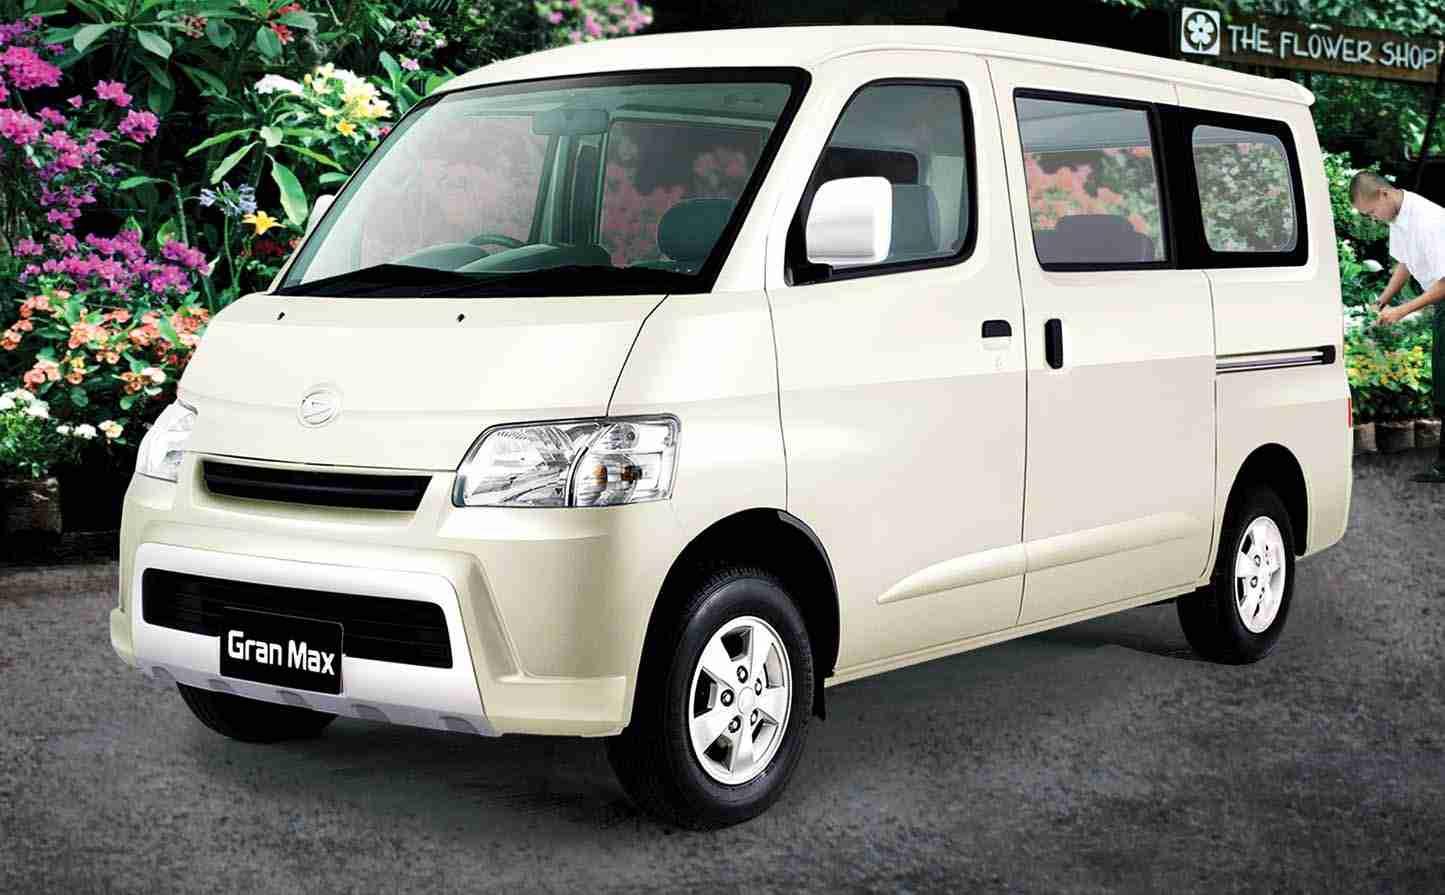 daihatsu-gran-max-minibus